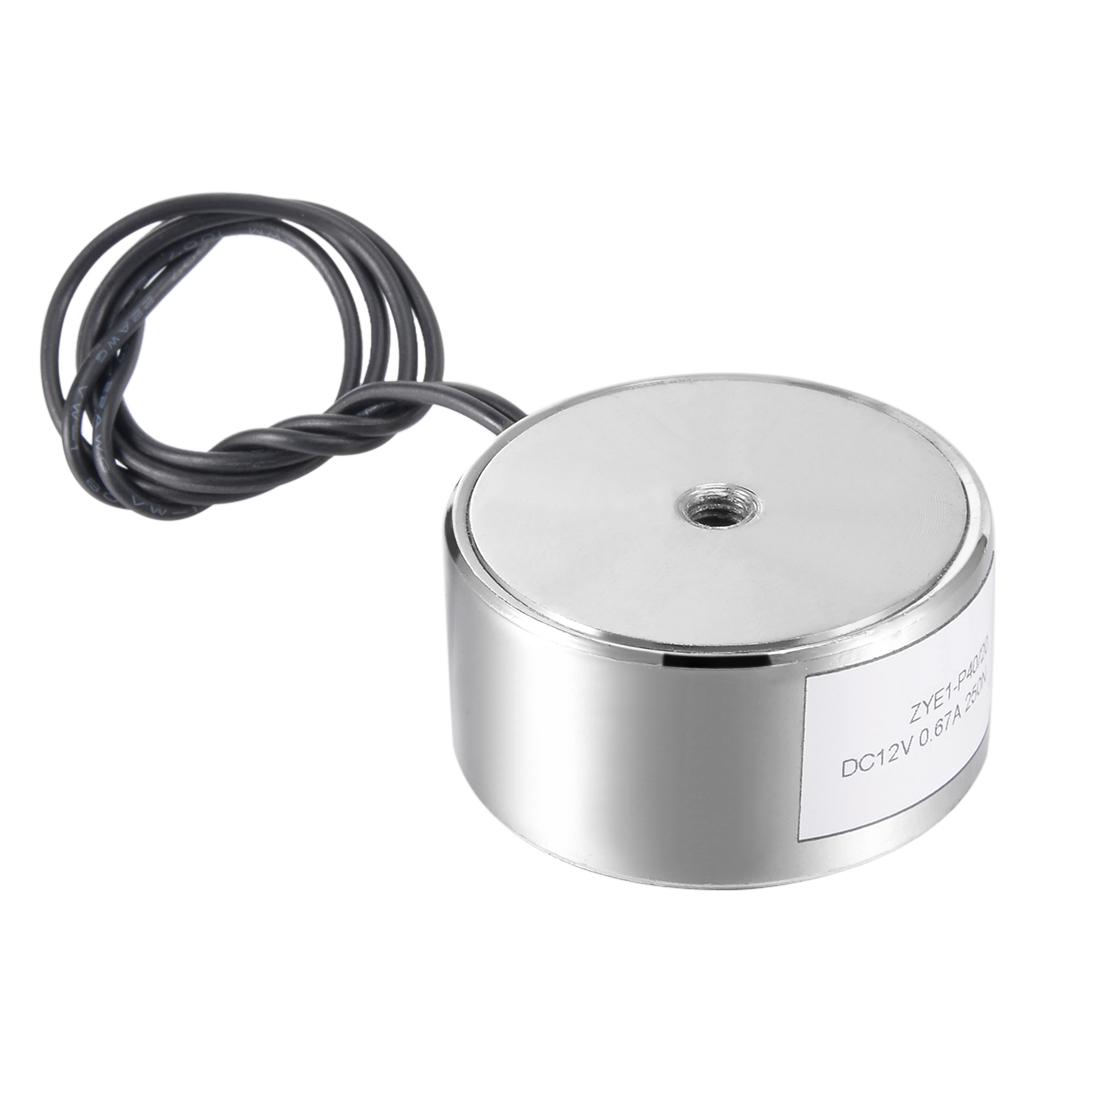 40mm x 20mm DC12V 0.67A 250N Sucking Disc Solenoid Lift Holding Electromagnet